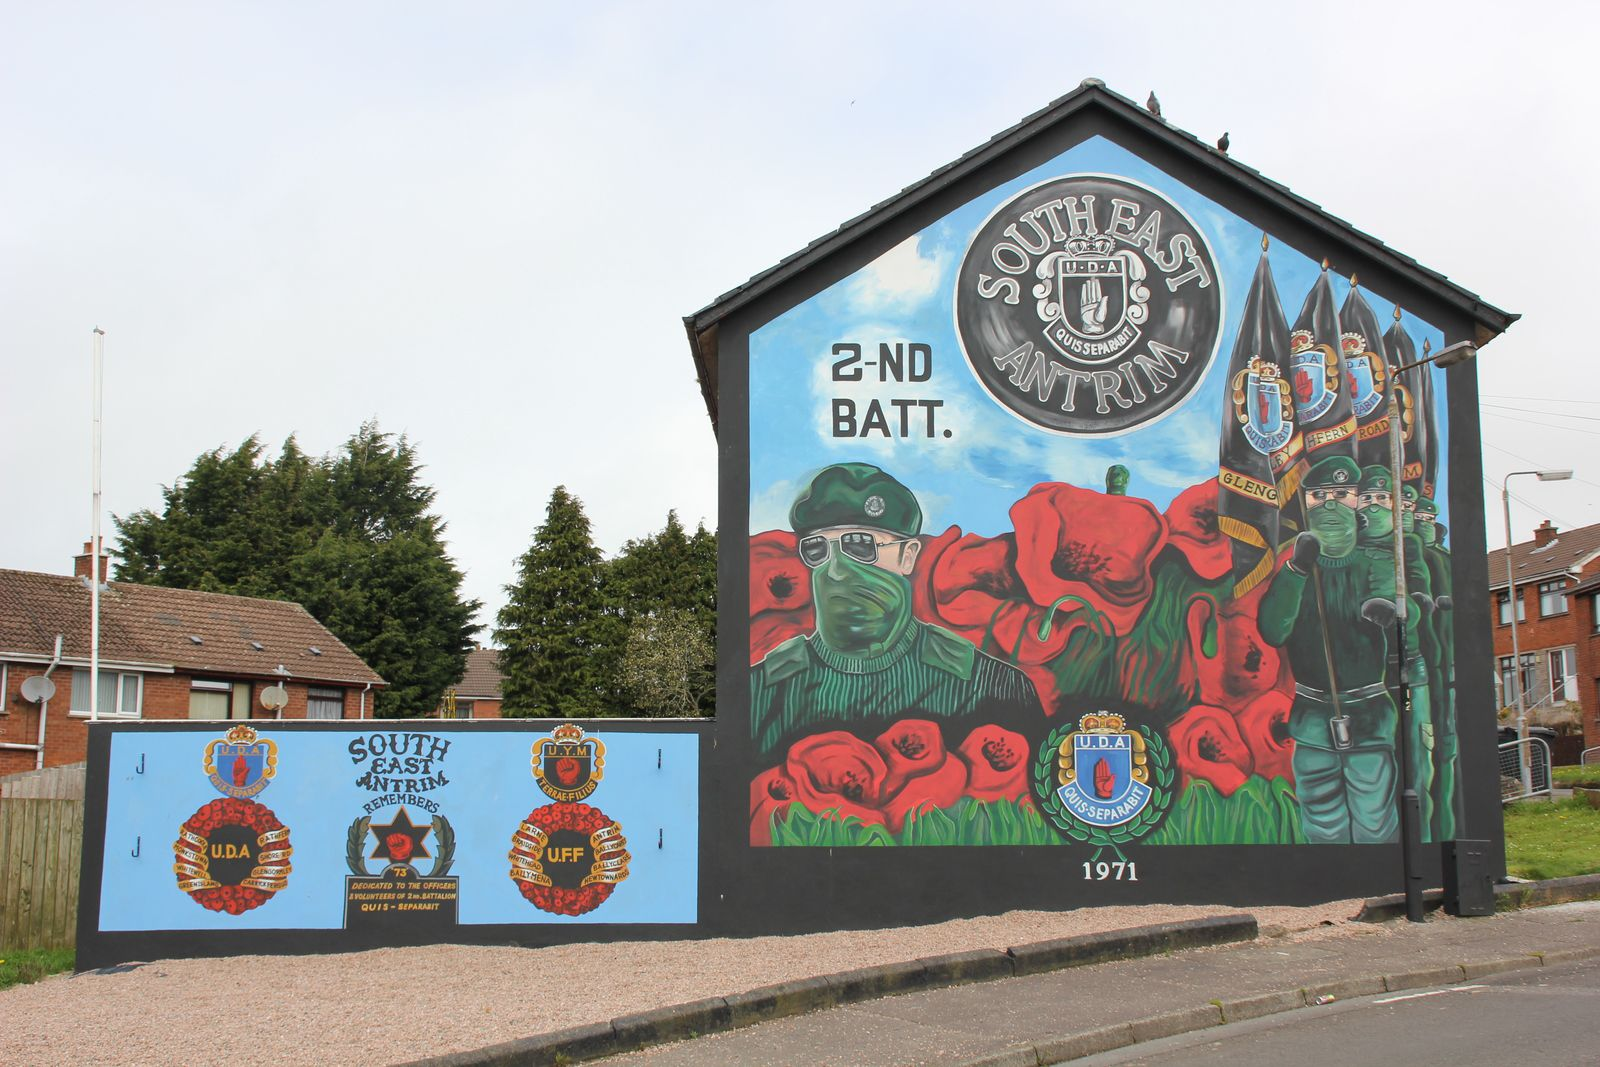 823) Queens Ave, Glengormley, Newtownabbey, North Belfast